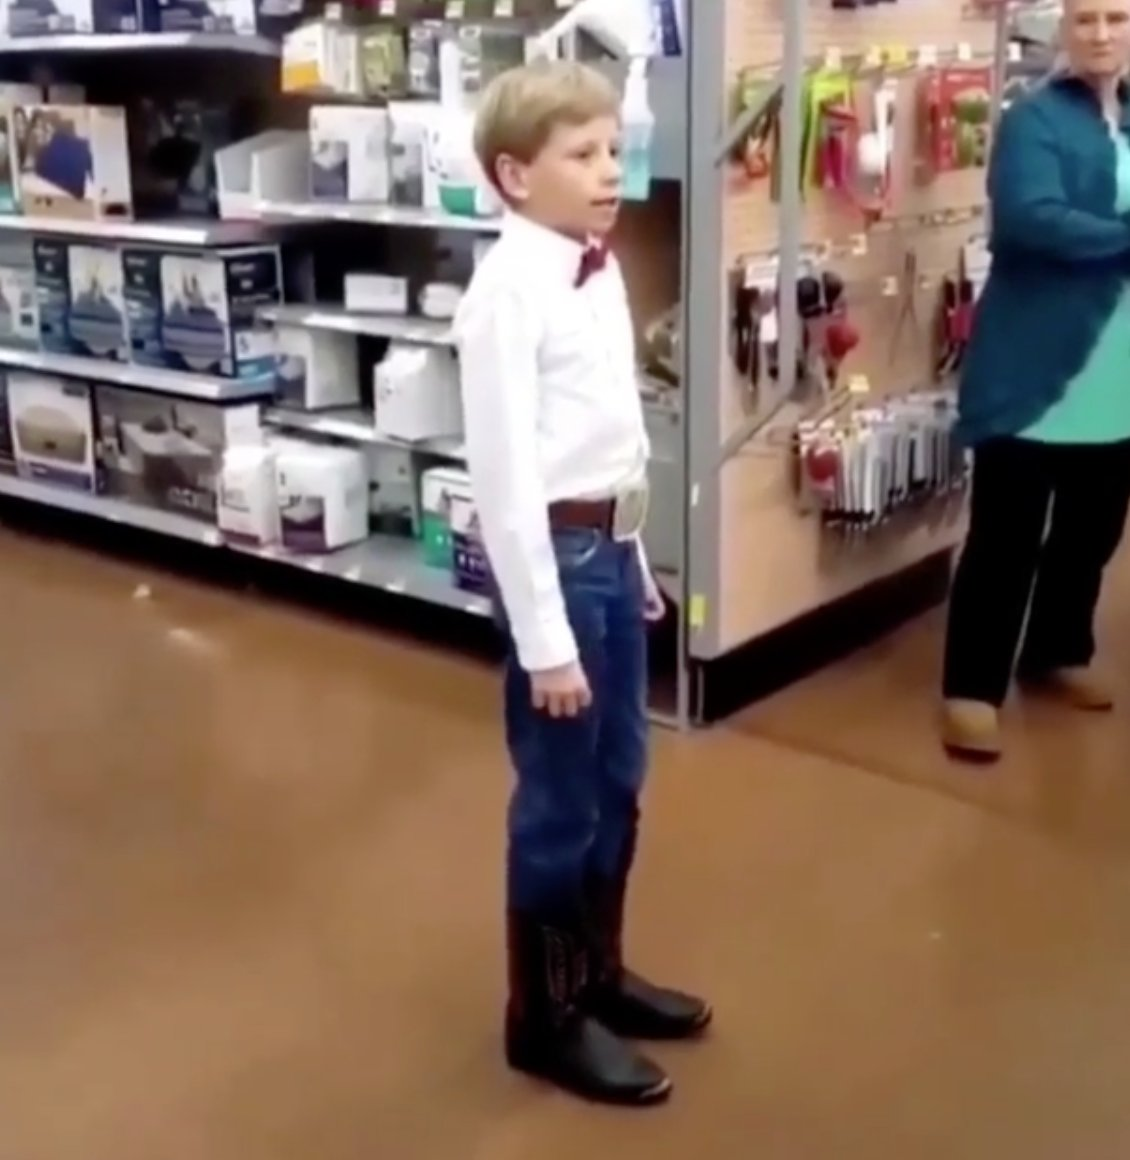 Walmart yodeling kid Mason Ramsey says h...